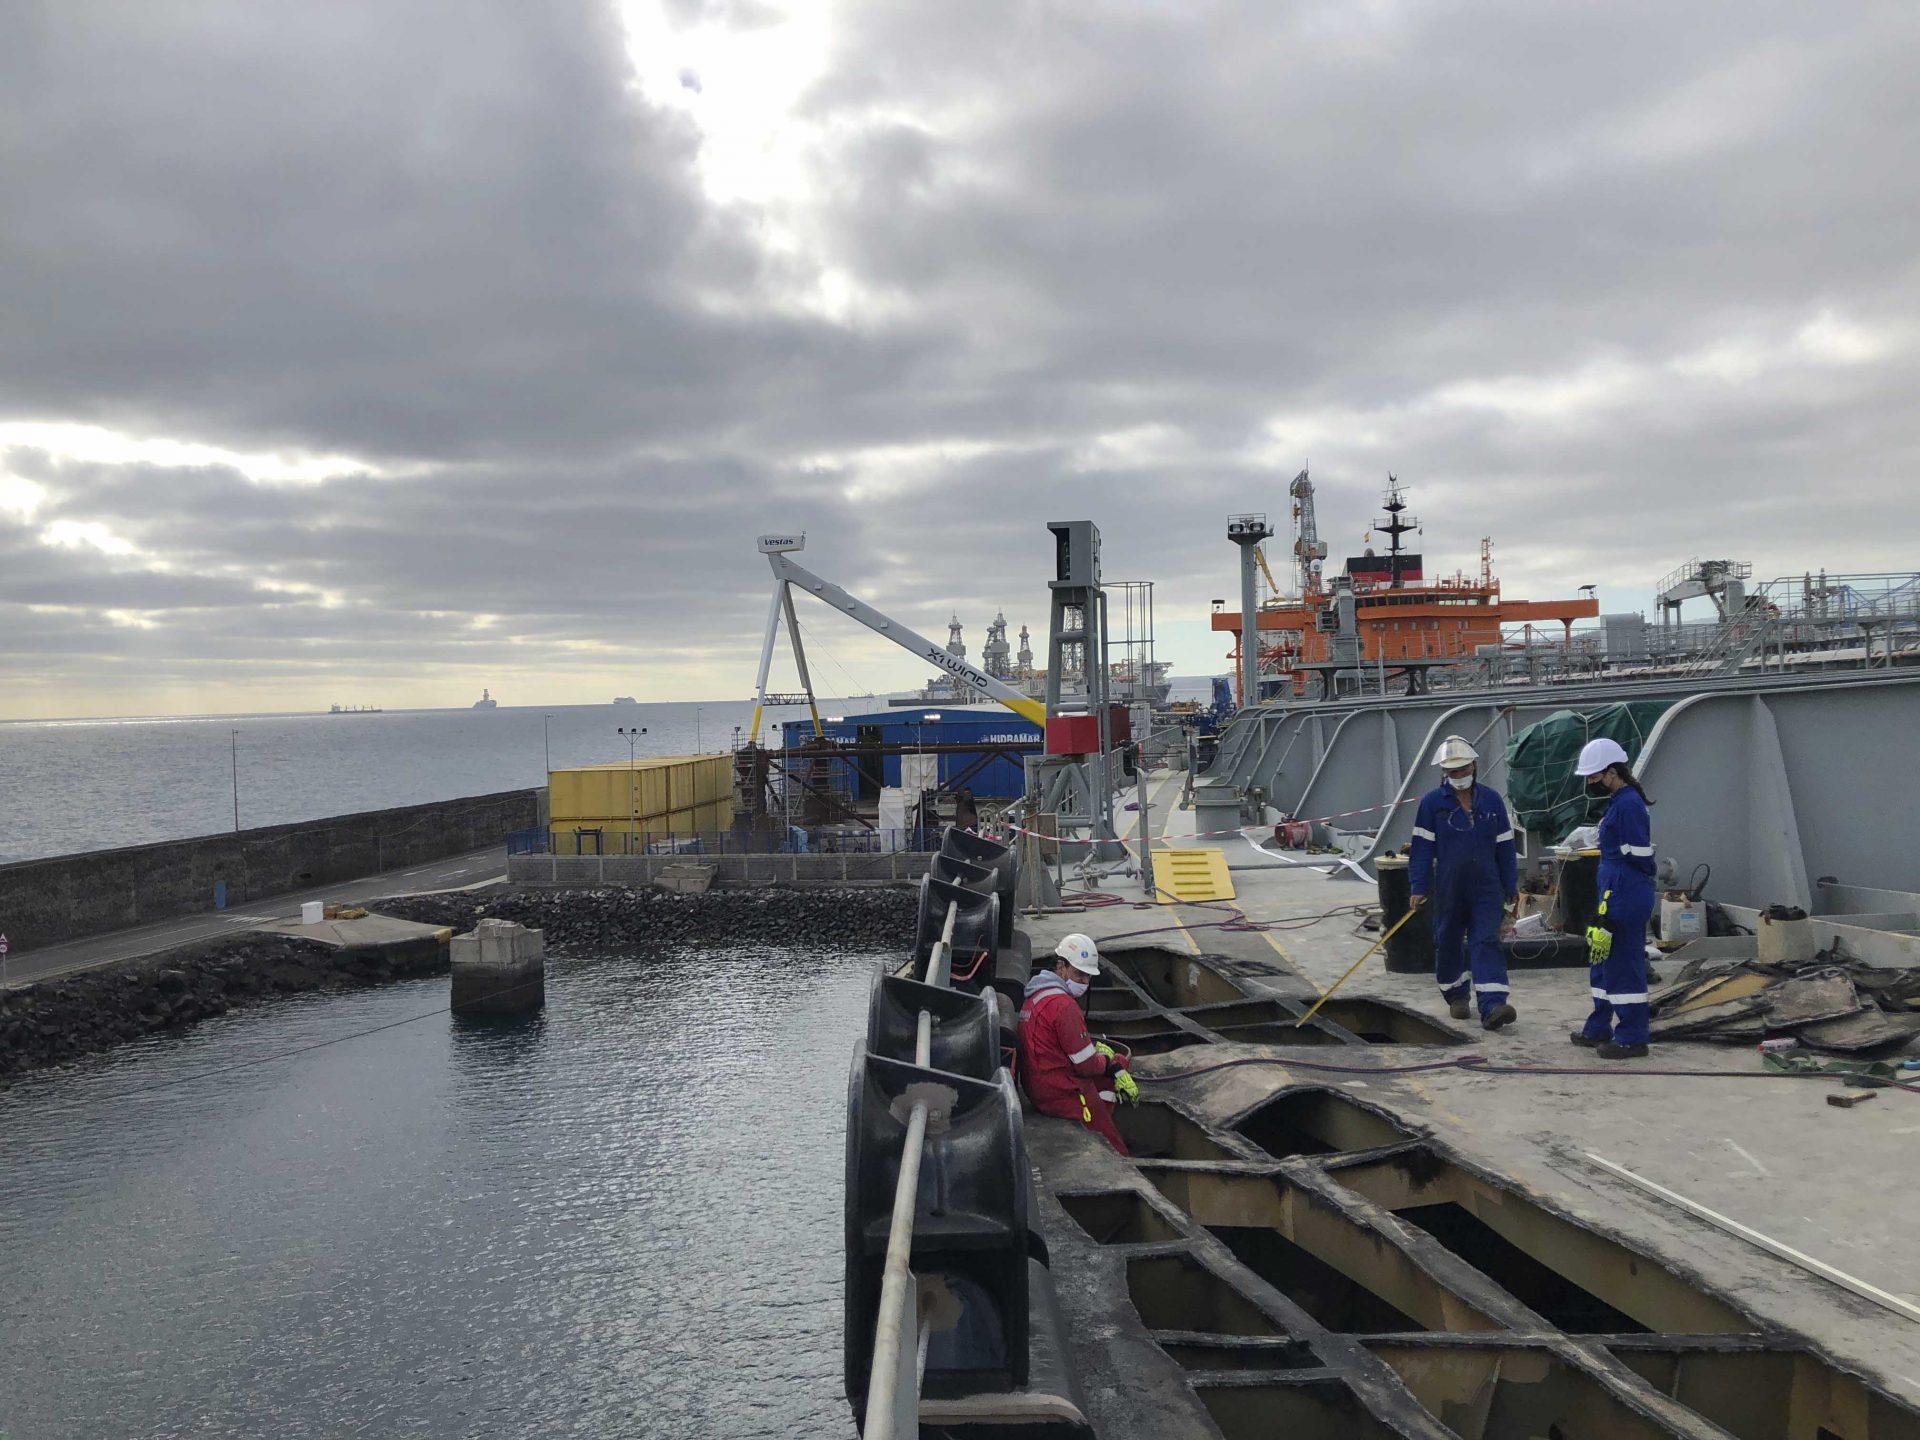 hidramar group takes on hull repair of a crude oil tanker vessel ship metal cutting 001 1